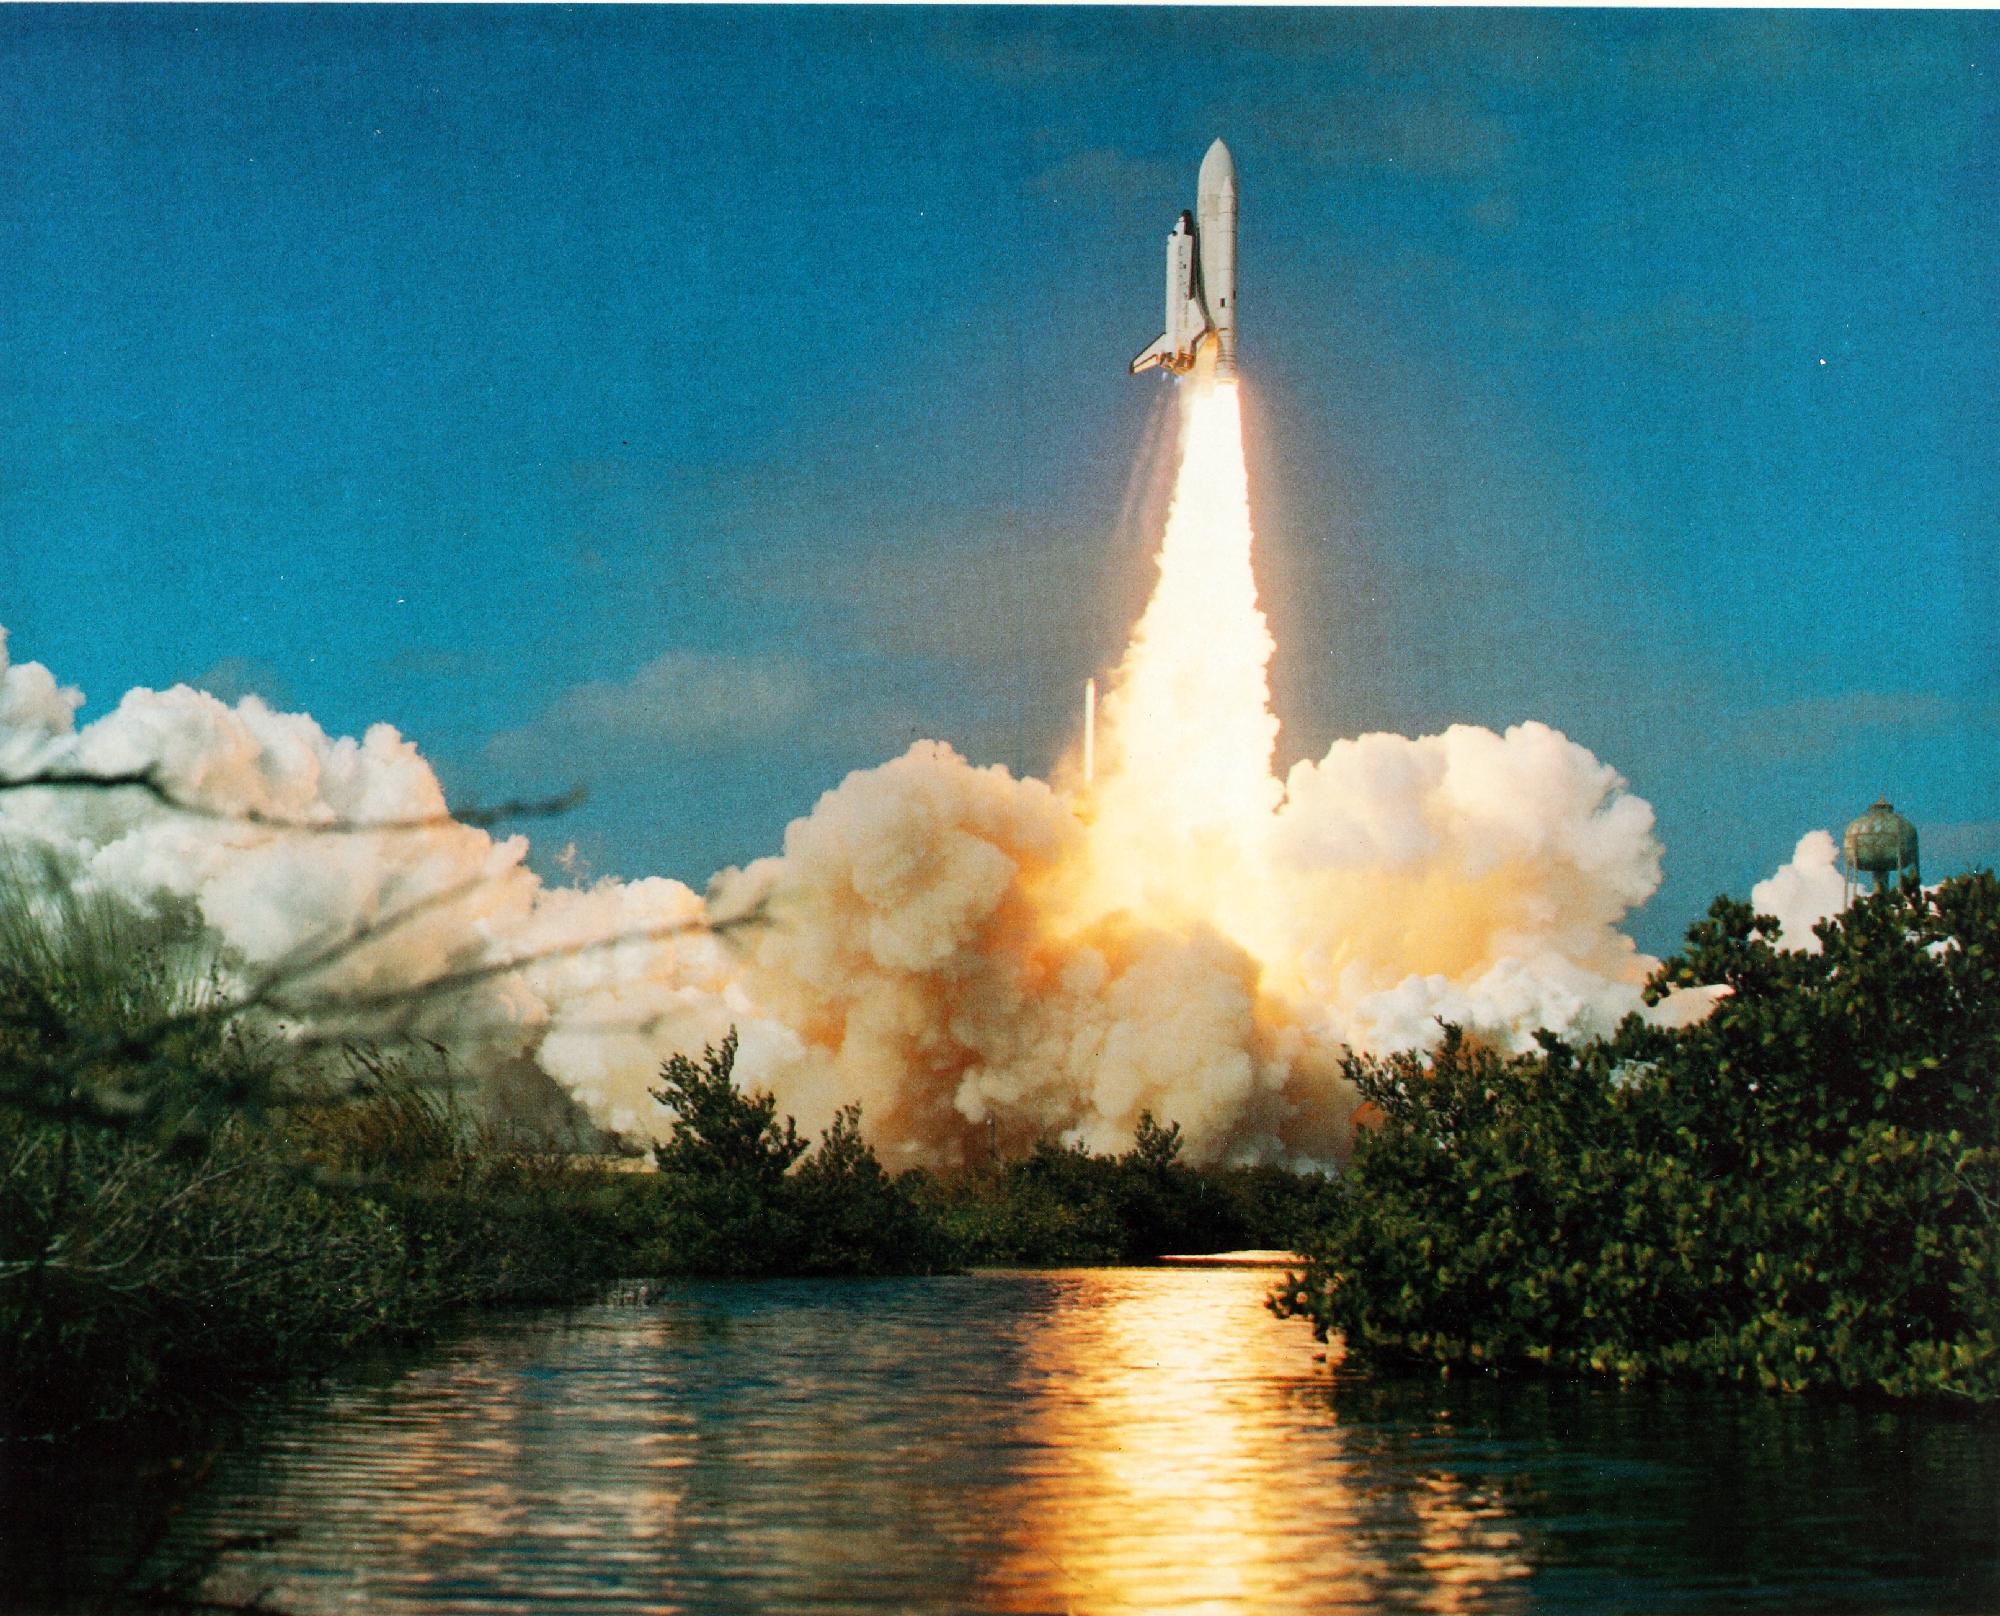 space shuttle columbia launch 1981 - photo #21